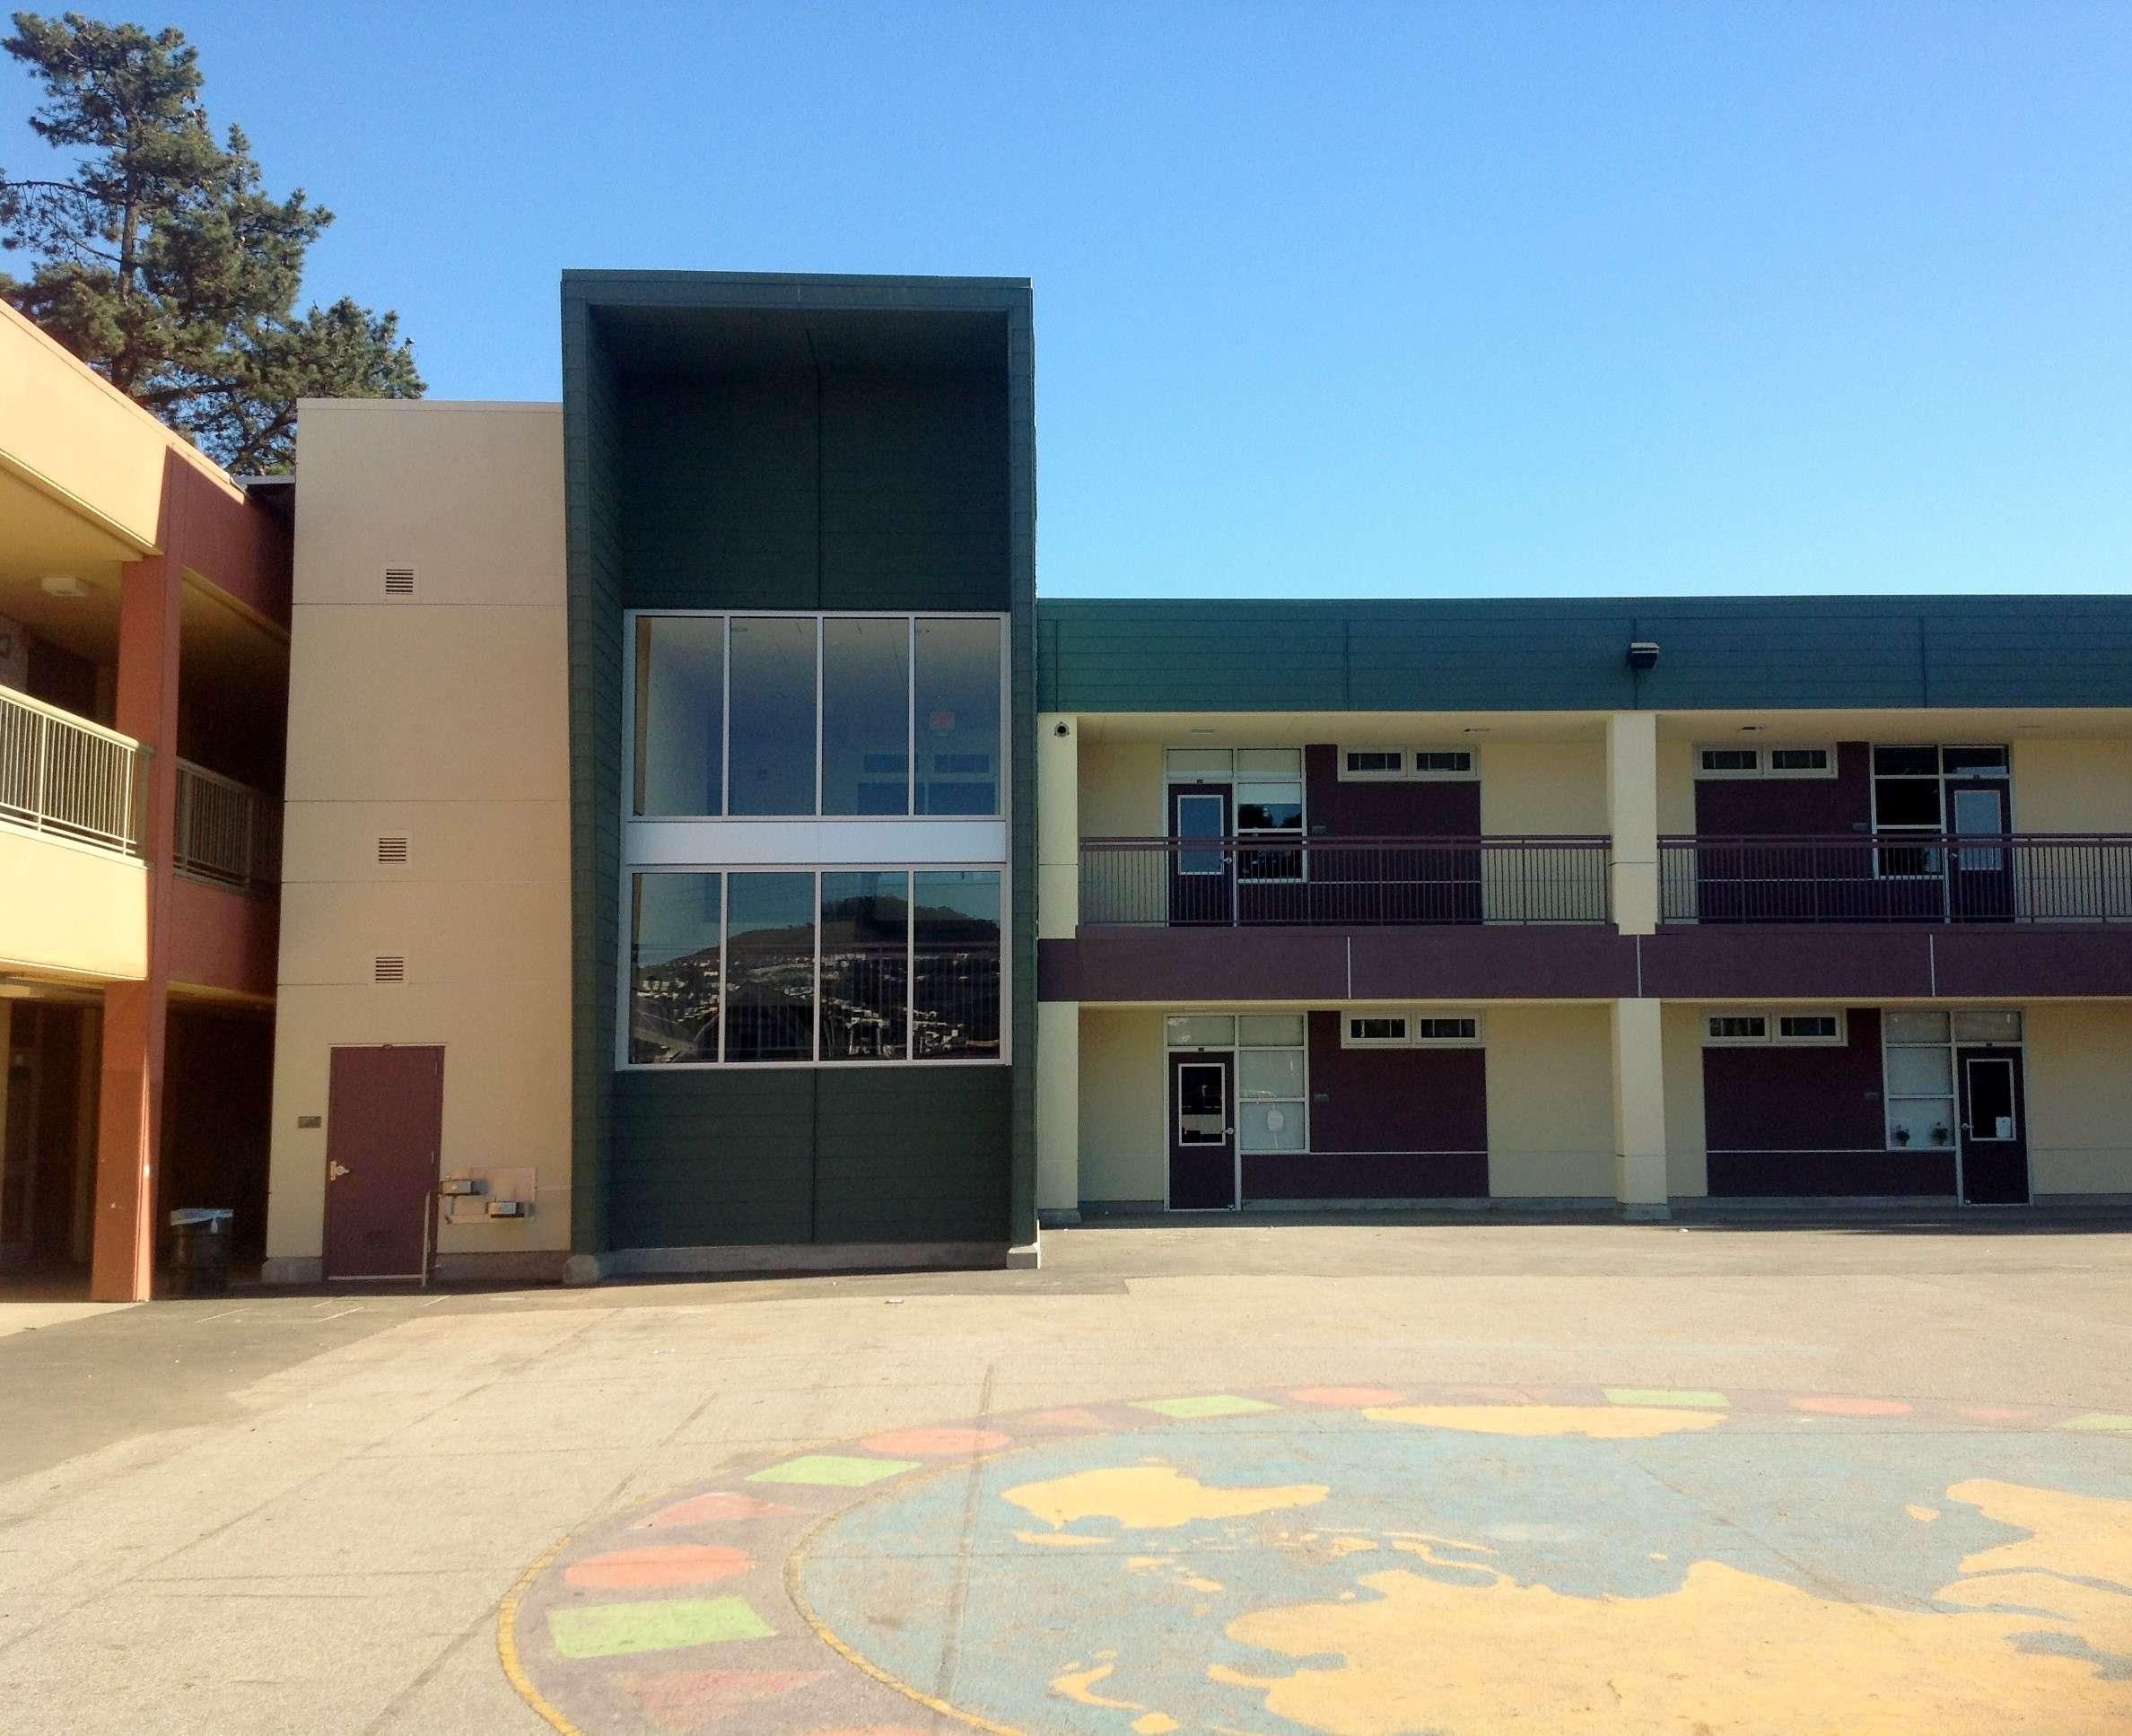 Monroe Elementary School